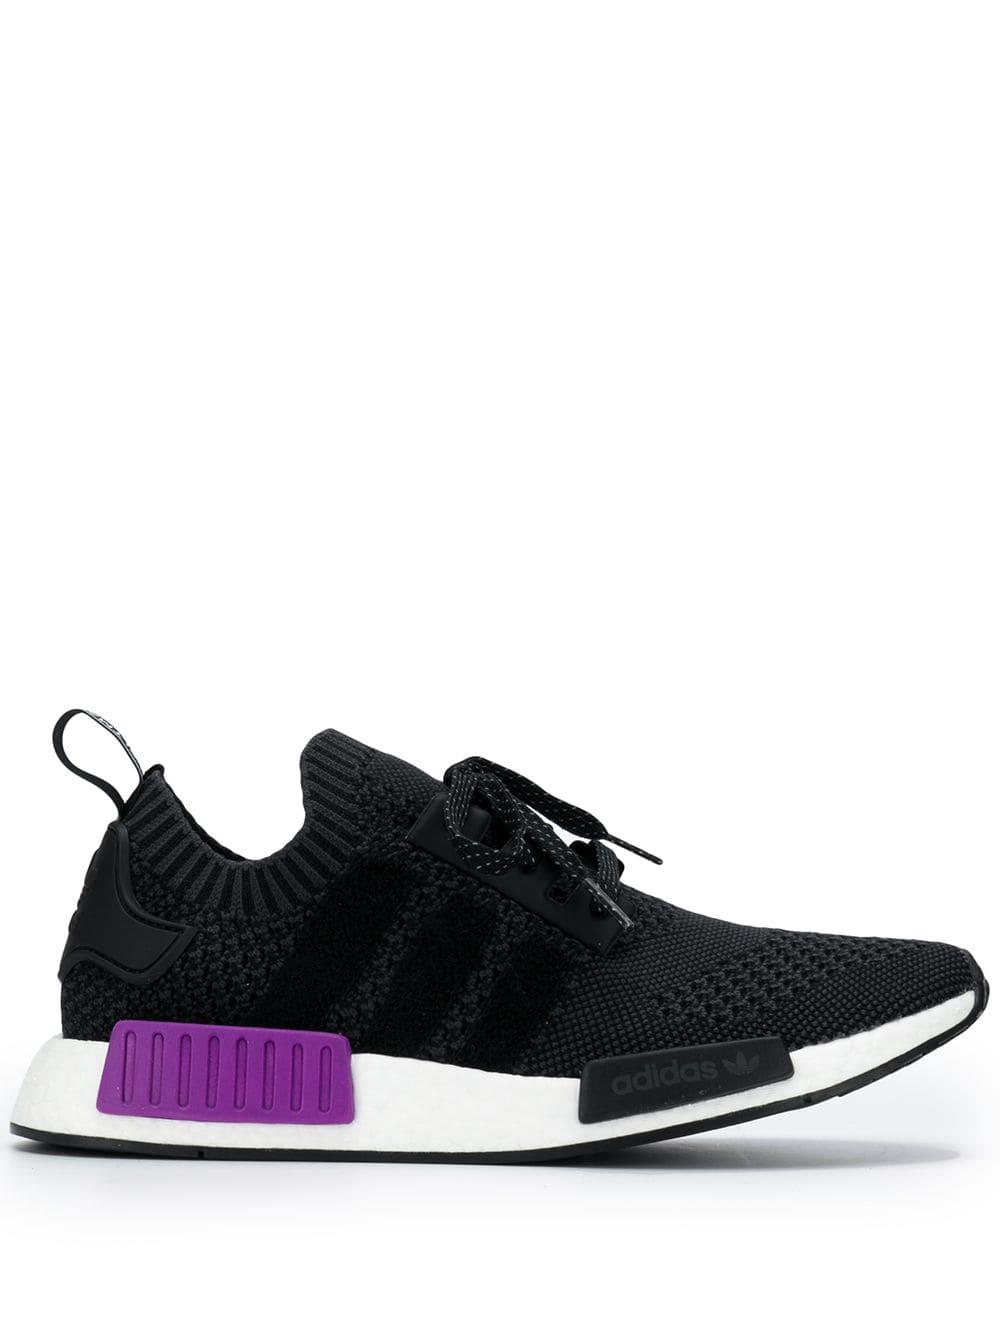 7cf9751919d52 ADIDAS ORIGINALS ADIDAS NMD R1 PRIMEKNIT SNEAKERS - BLACK.  adidasoriginals   shoes